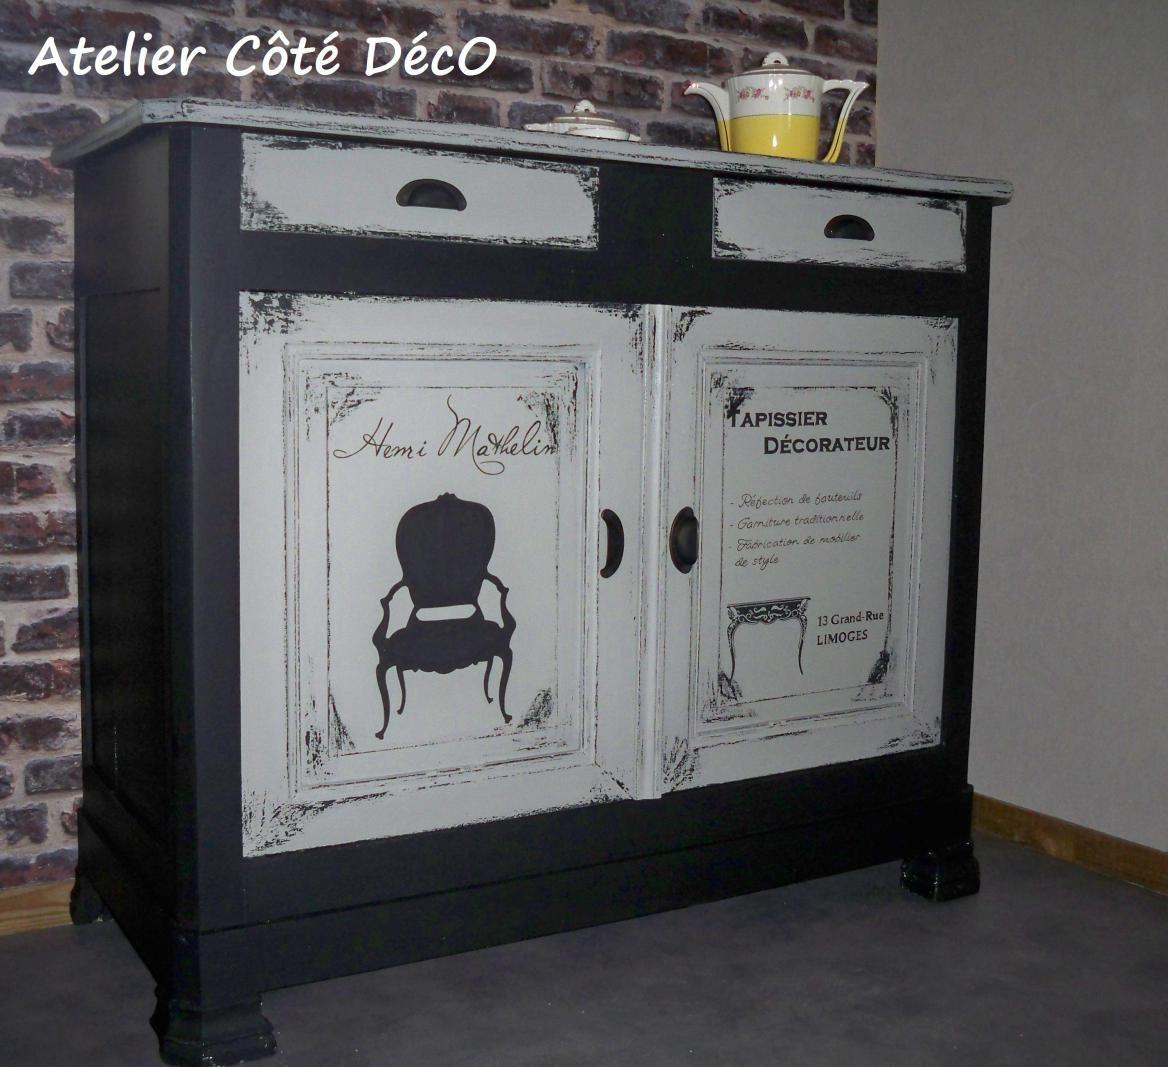 Salle A Manger Atelier Cote Deco Relooking De Mobilier Idee Deco Meuble Relooker Meuble